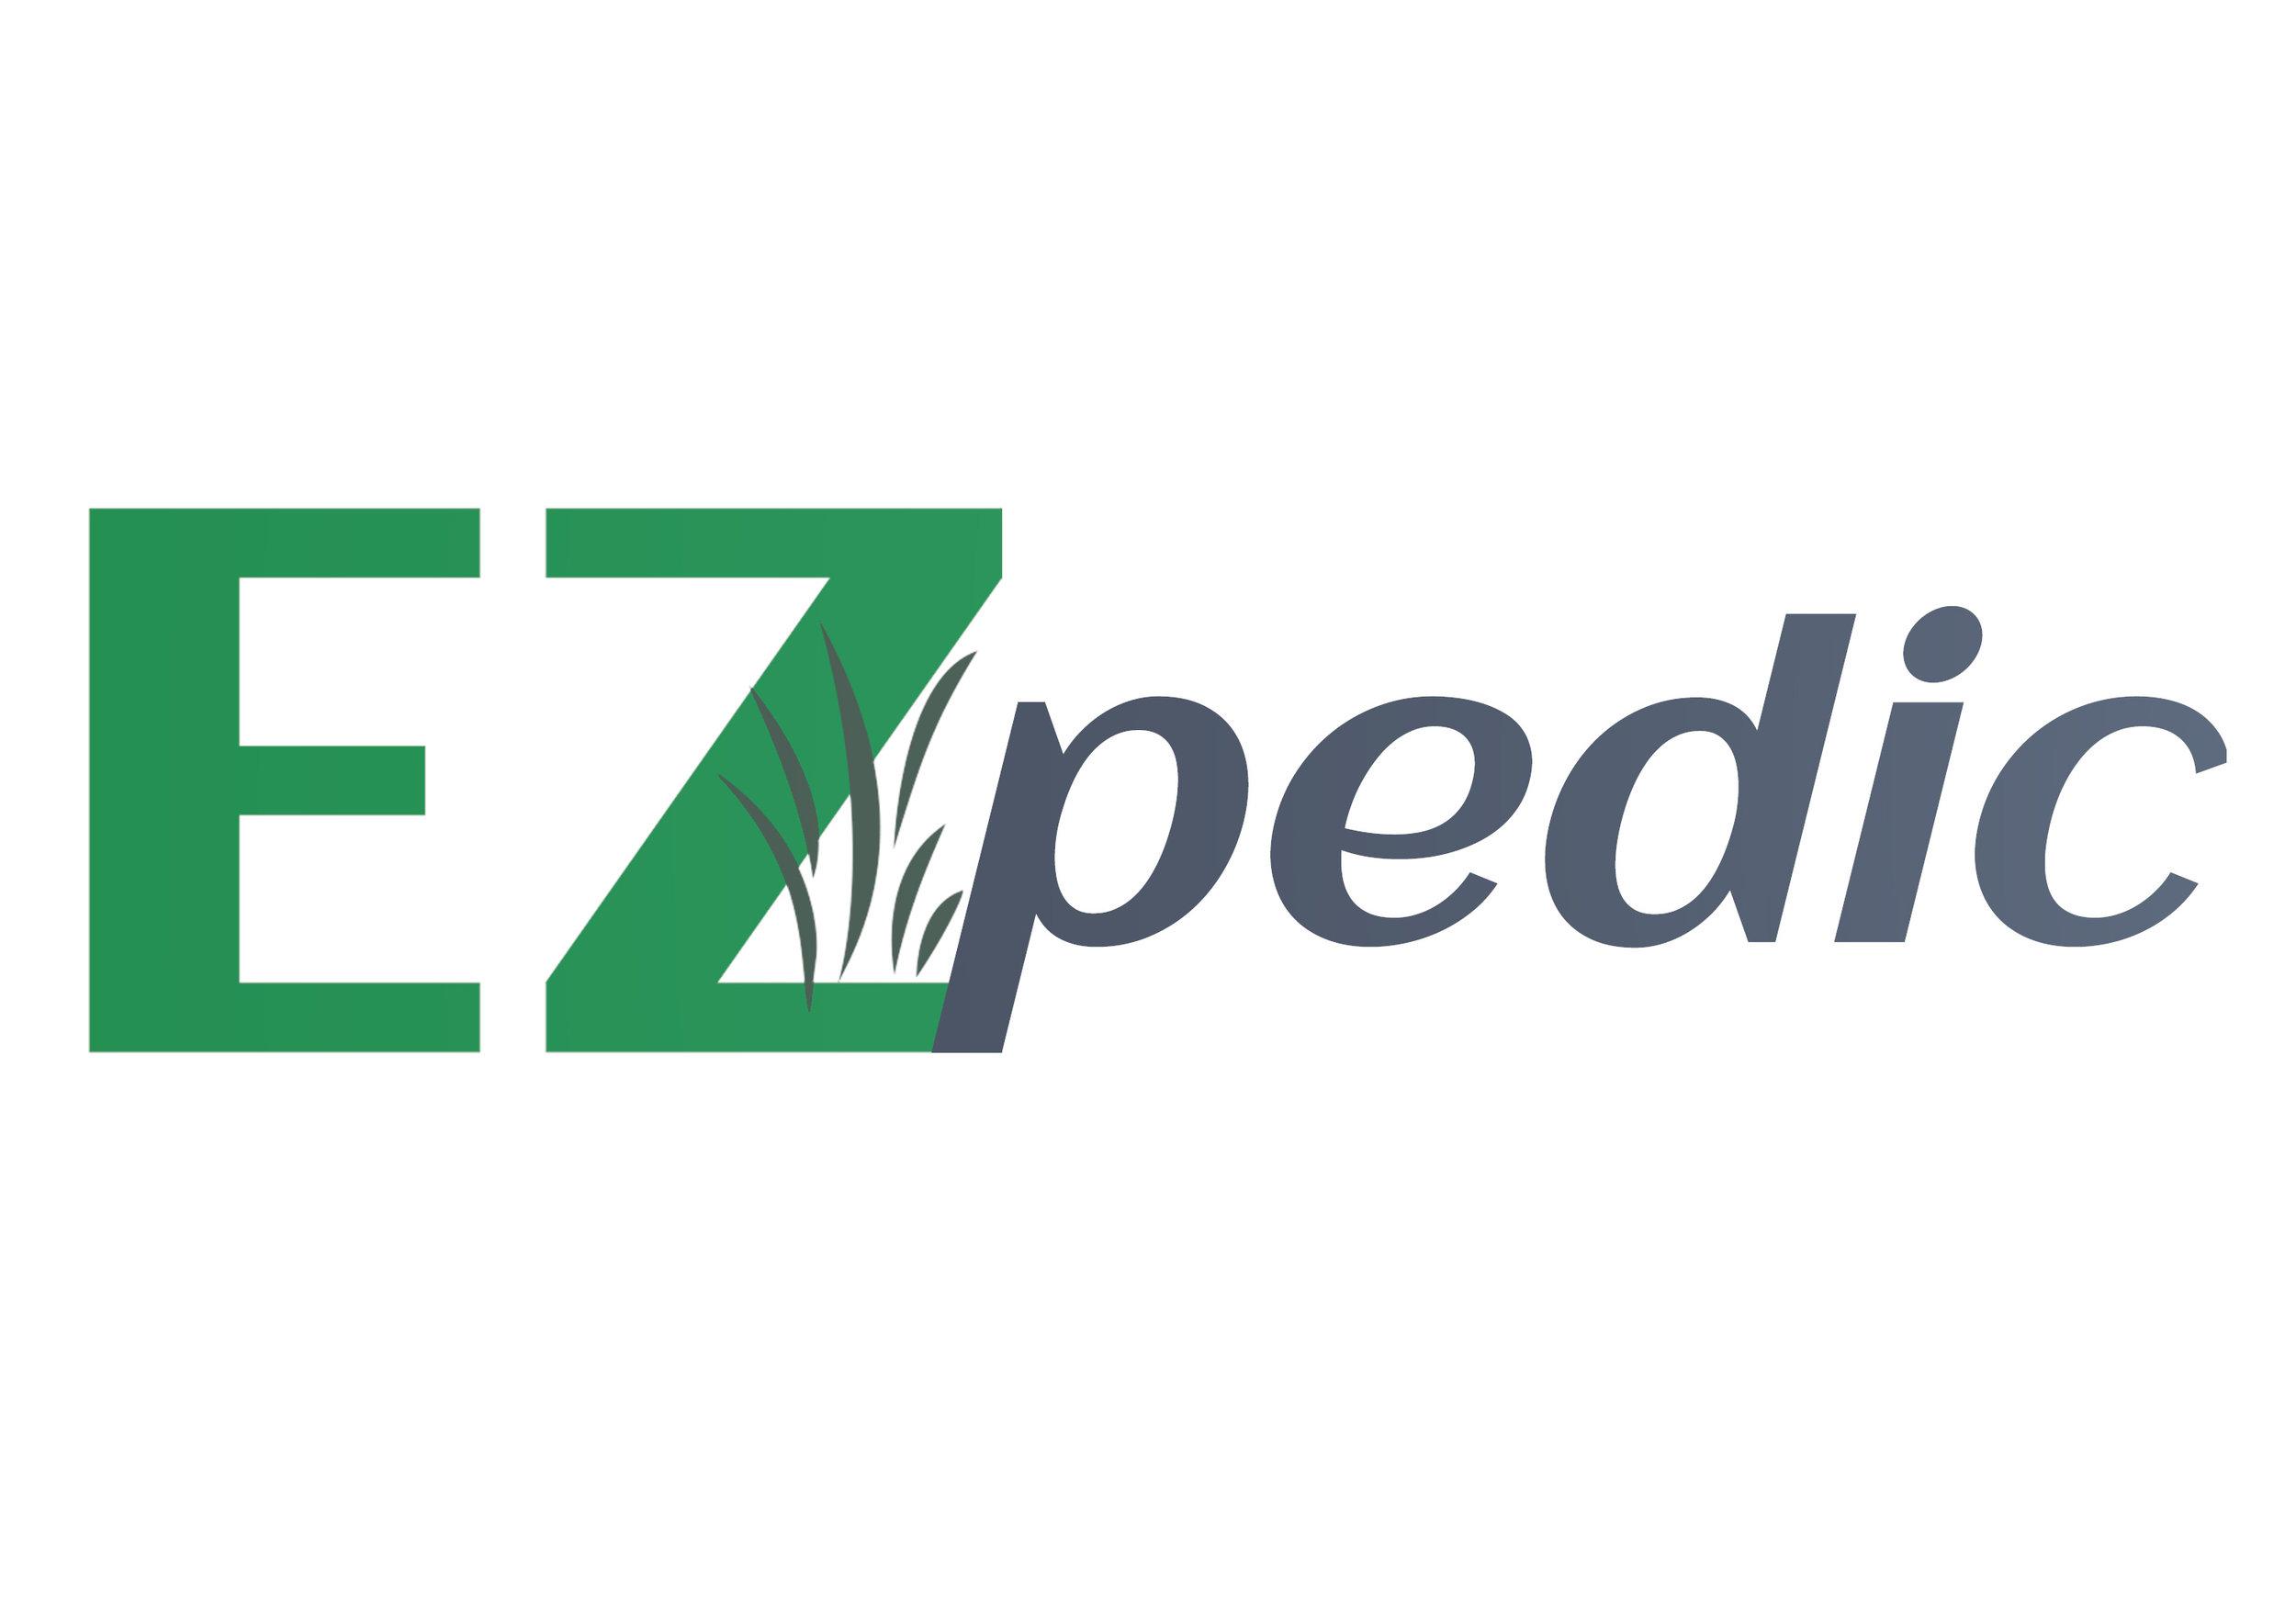 EZ Pedic Logo Crop.jpg